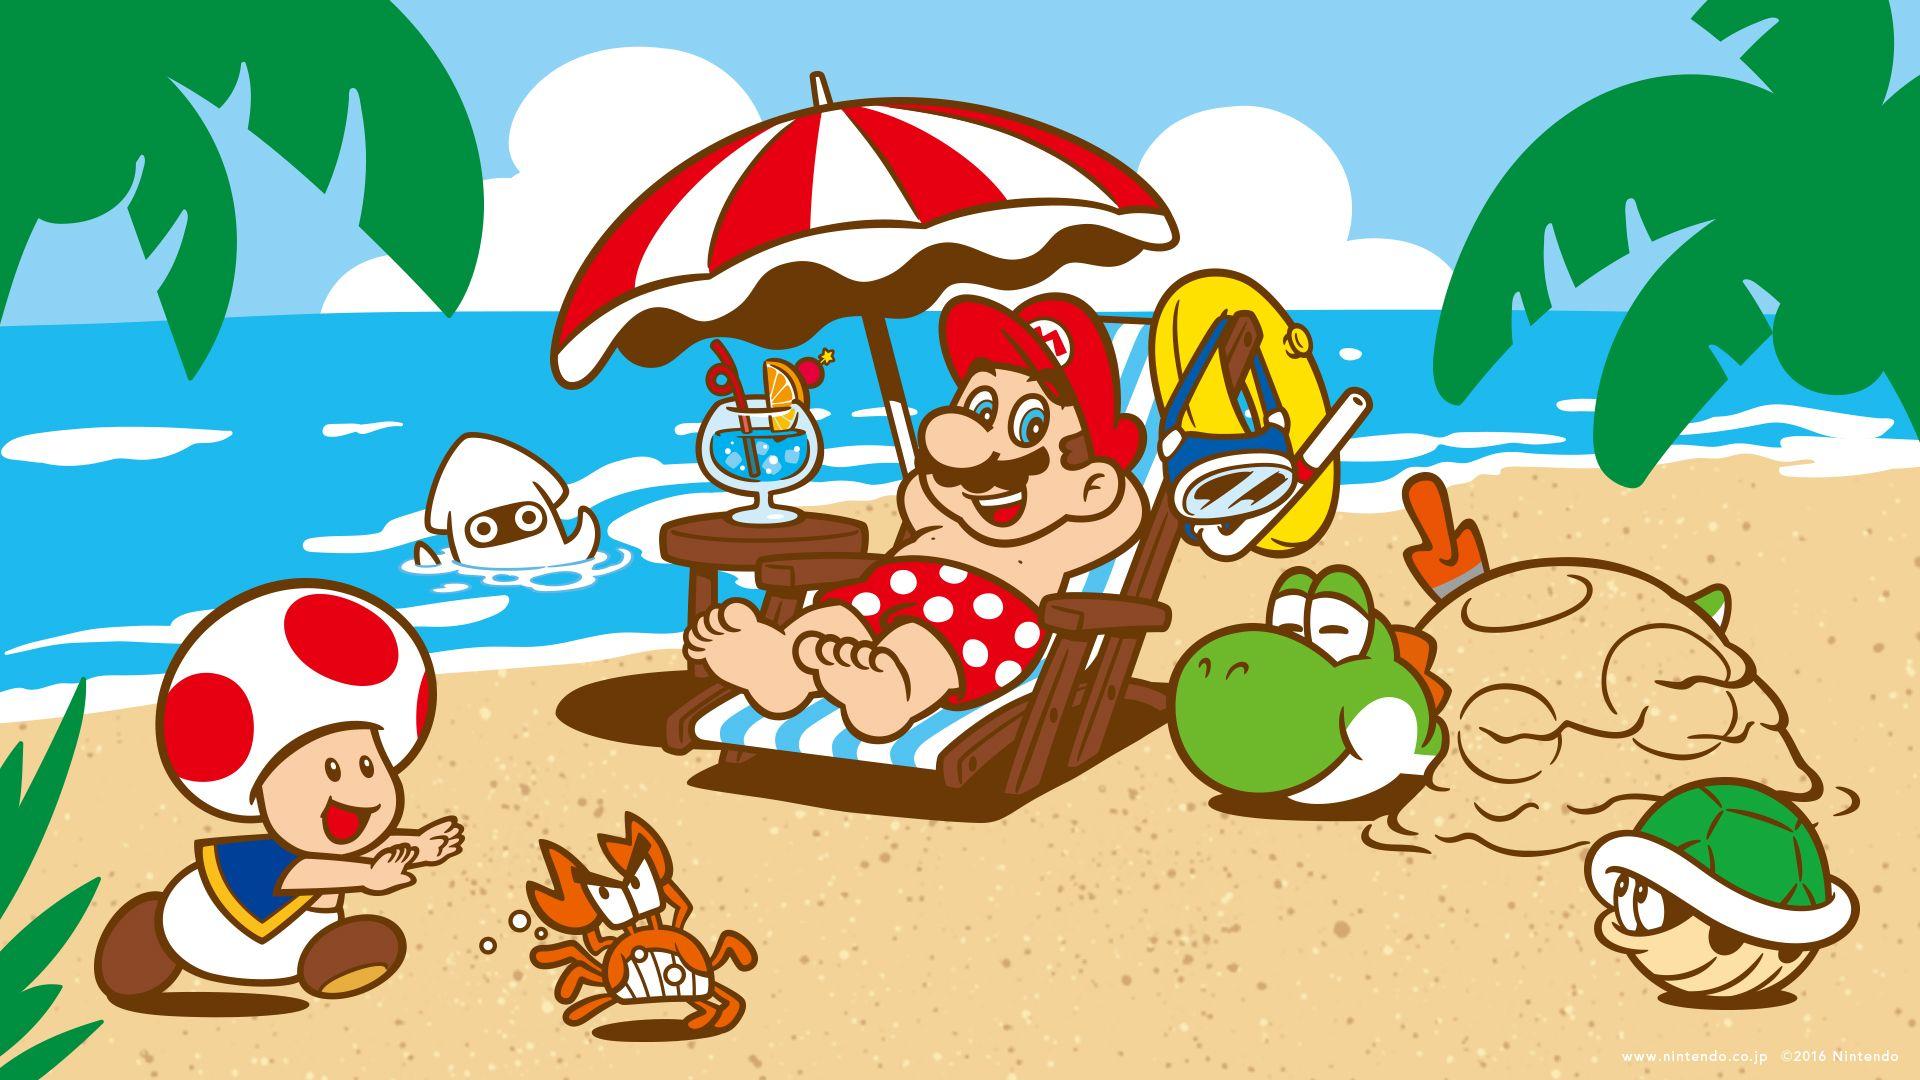 Super Mario desktop wallpaper 1920 x 1080 Mario et luigi